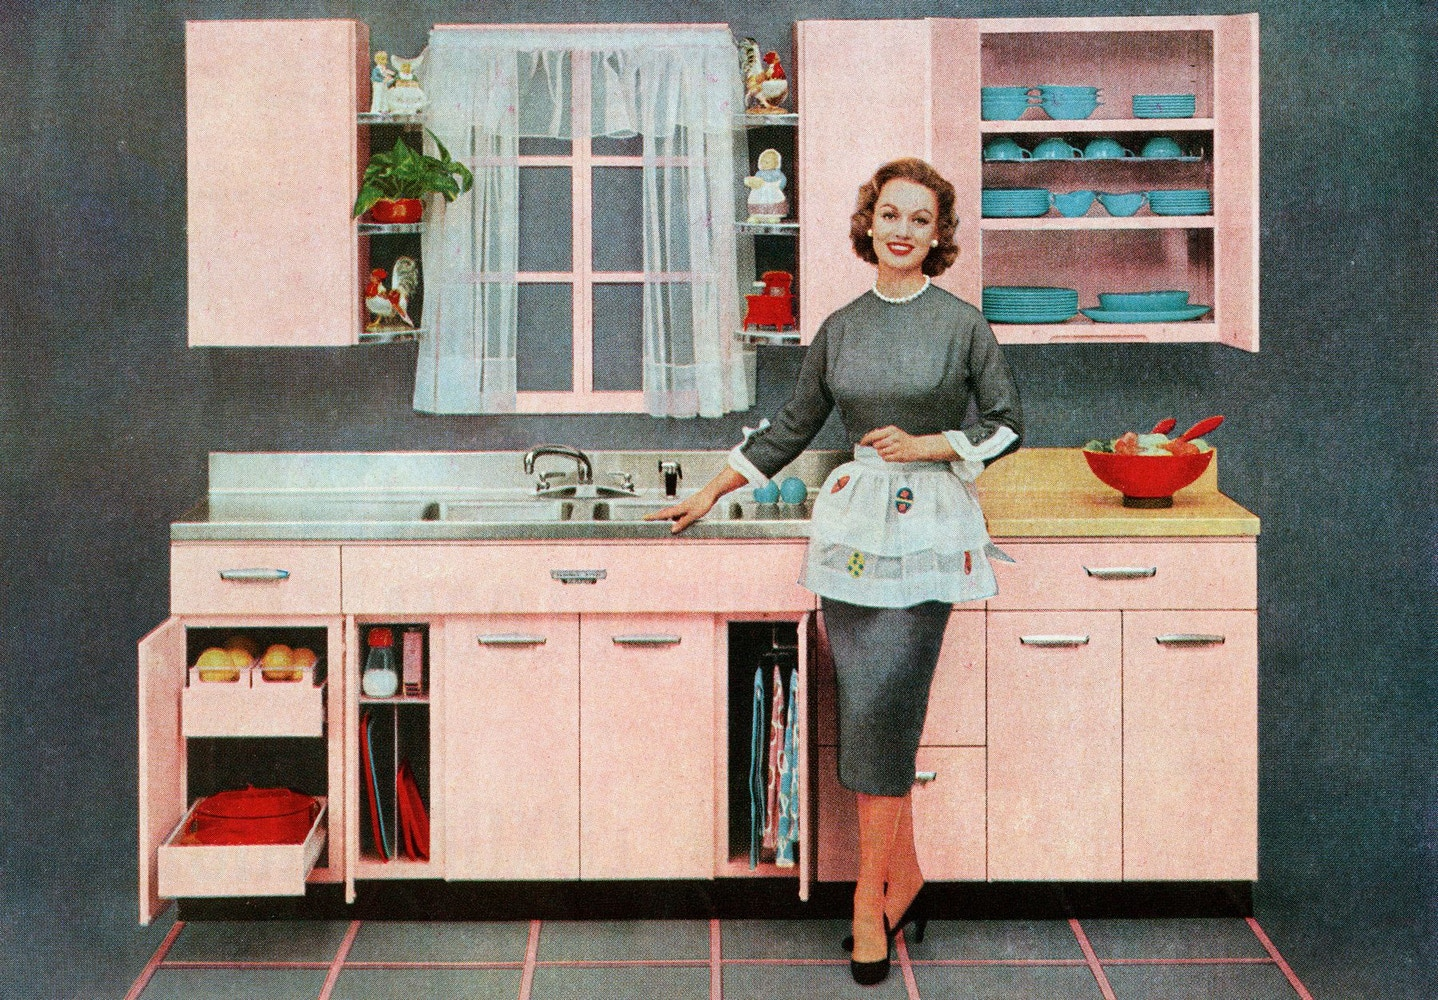 Kitchens Design Through The Decades: 1920's - 1950's